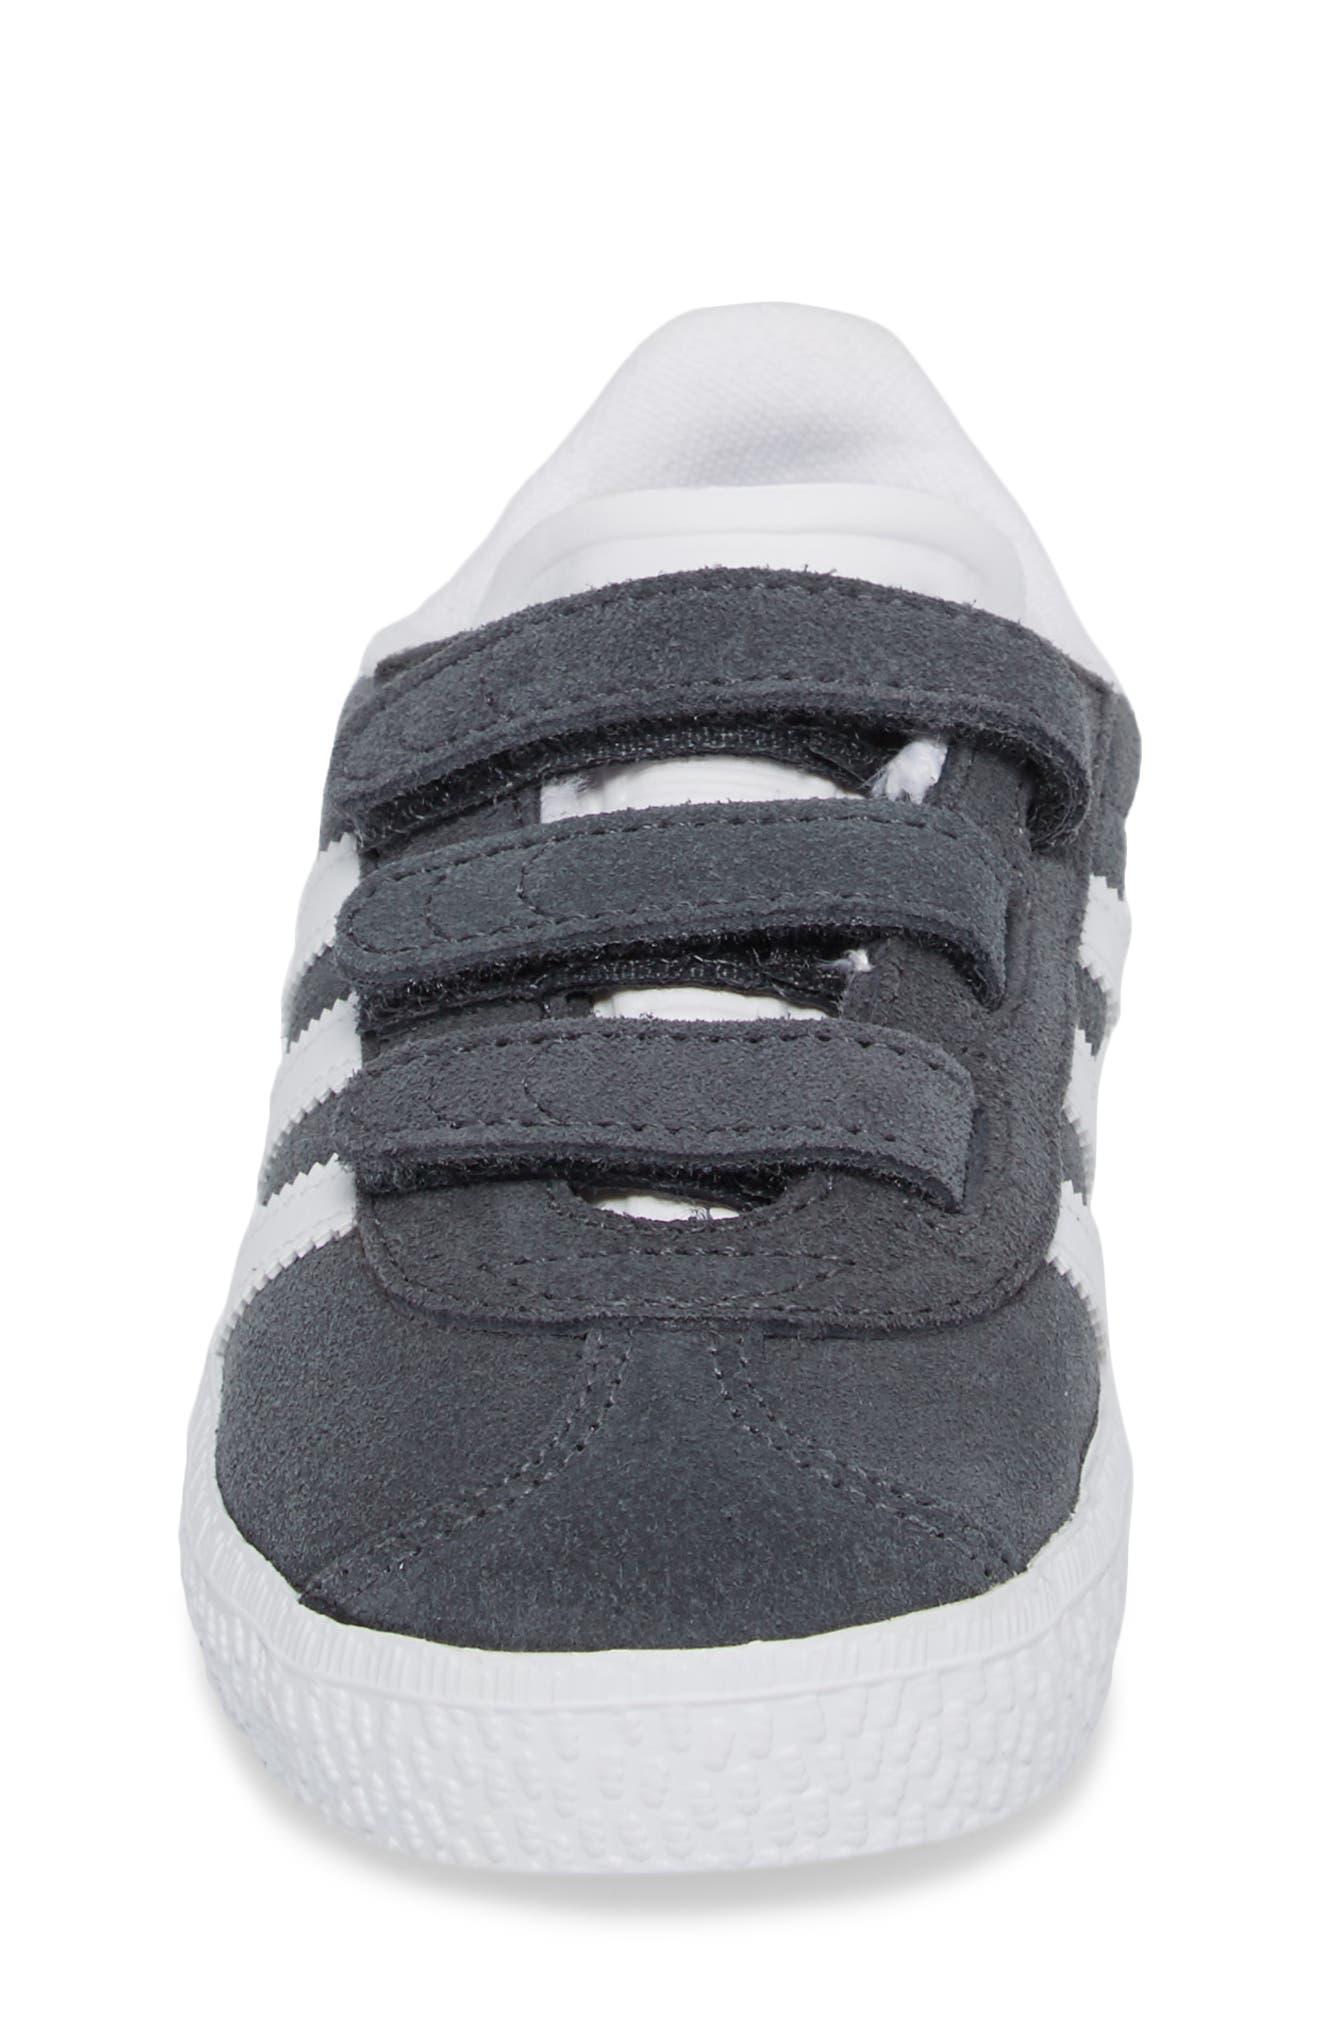 Gazelle Sneaker,                             Alternate thumbnail 4, color,                             SOLID GREY / WHITE / WHITE